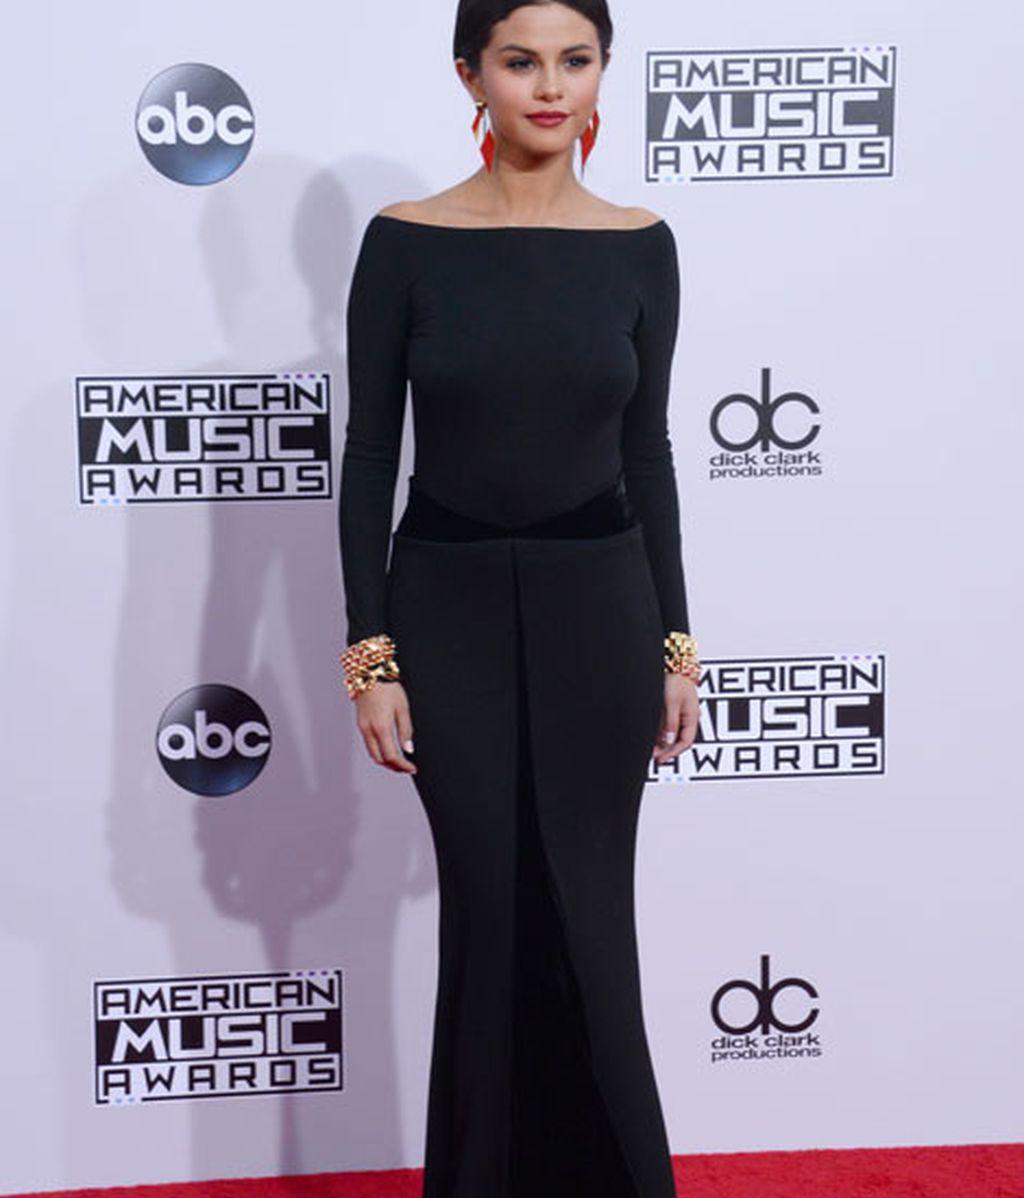 Selena Gomez, de Armani Privé, lució un vestido negro con corte sirena